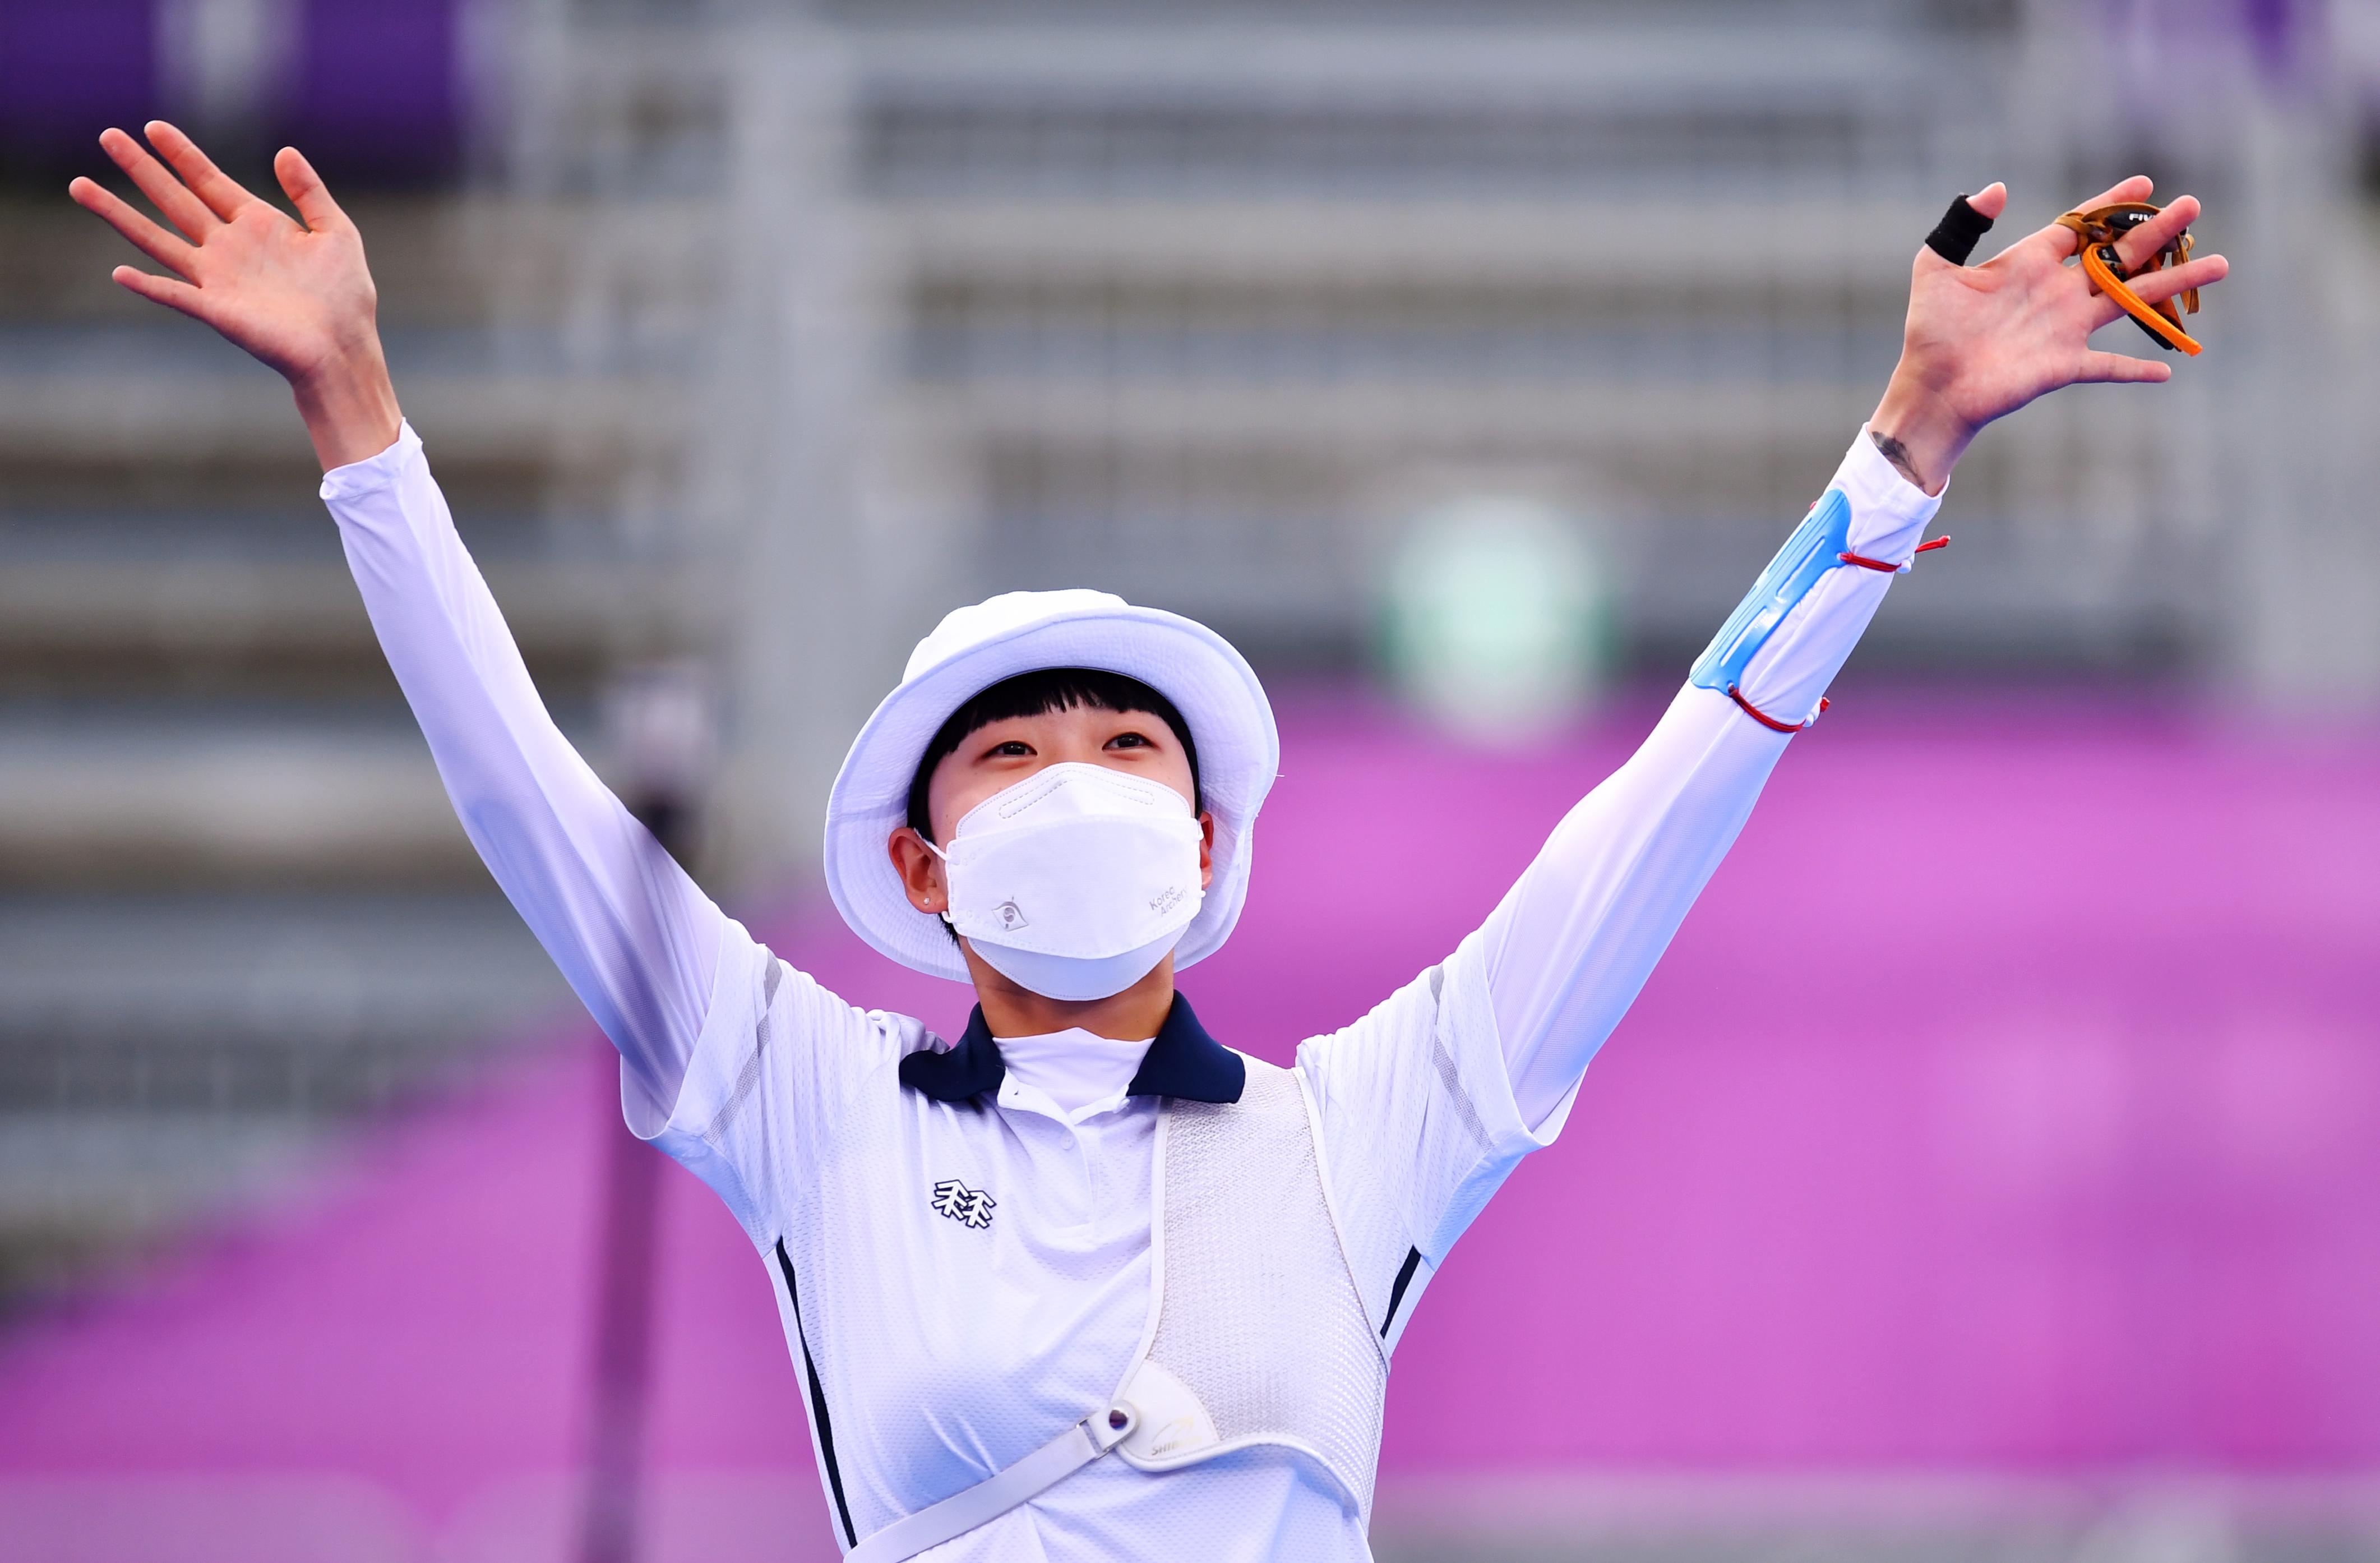 Tokyo 2020 Olympics - Archery - Women's Individual - Gold medal match - Yumenoshima Archery Field, Tokyo, Japan - July 30, 2021. An San of South Korea celebrates after winning gold REUTERS/Clodagh Kilcoyne